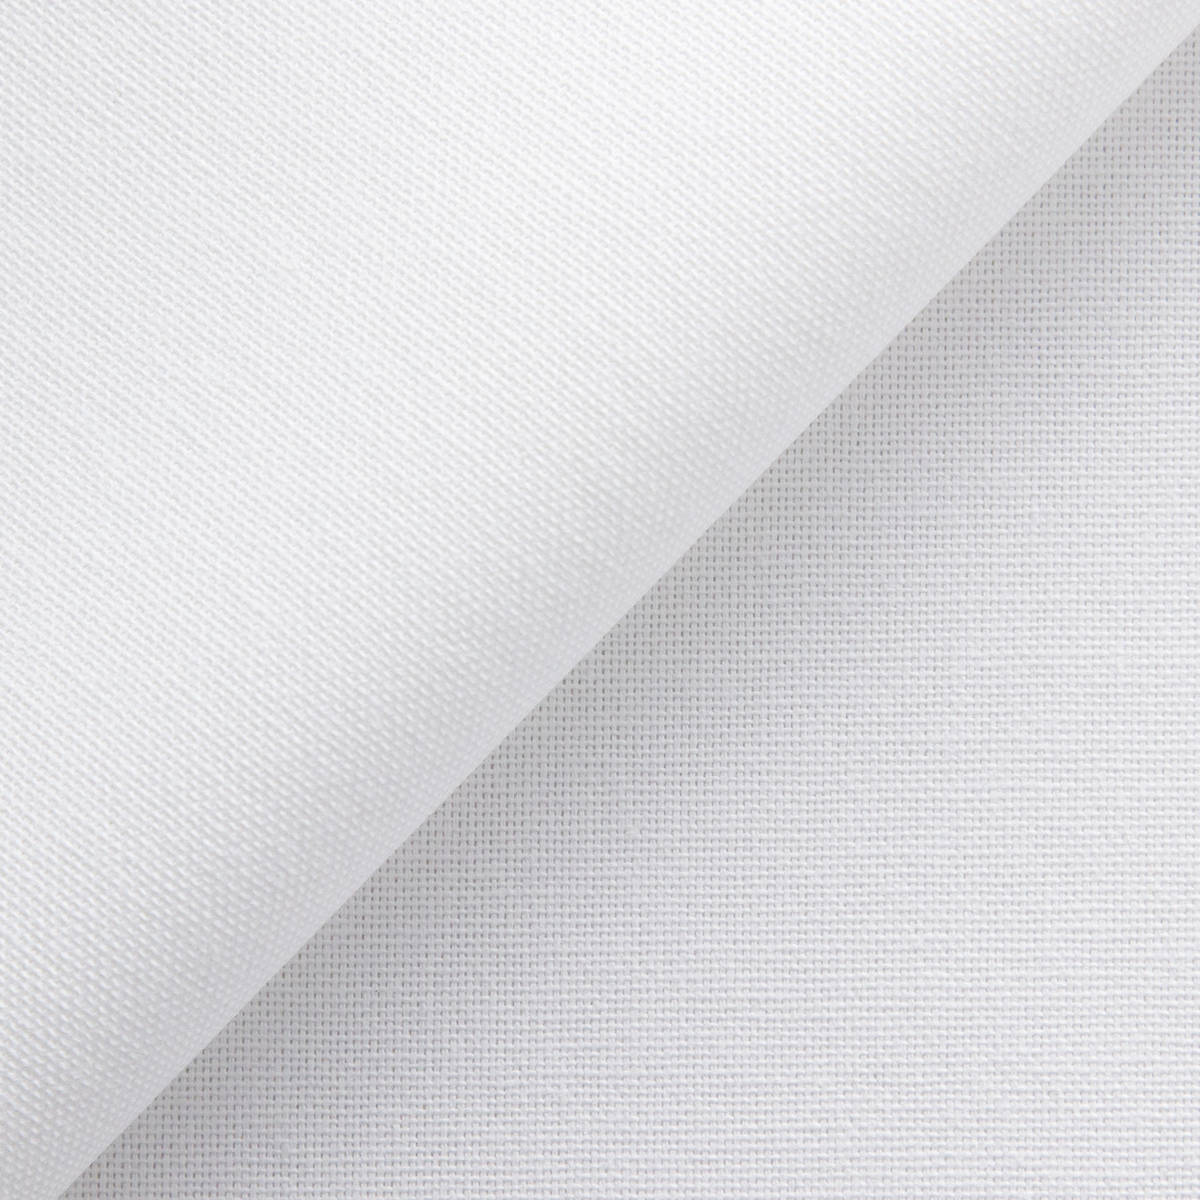 Custom Printed Tea Towel Cotton Fabric